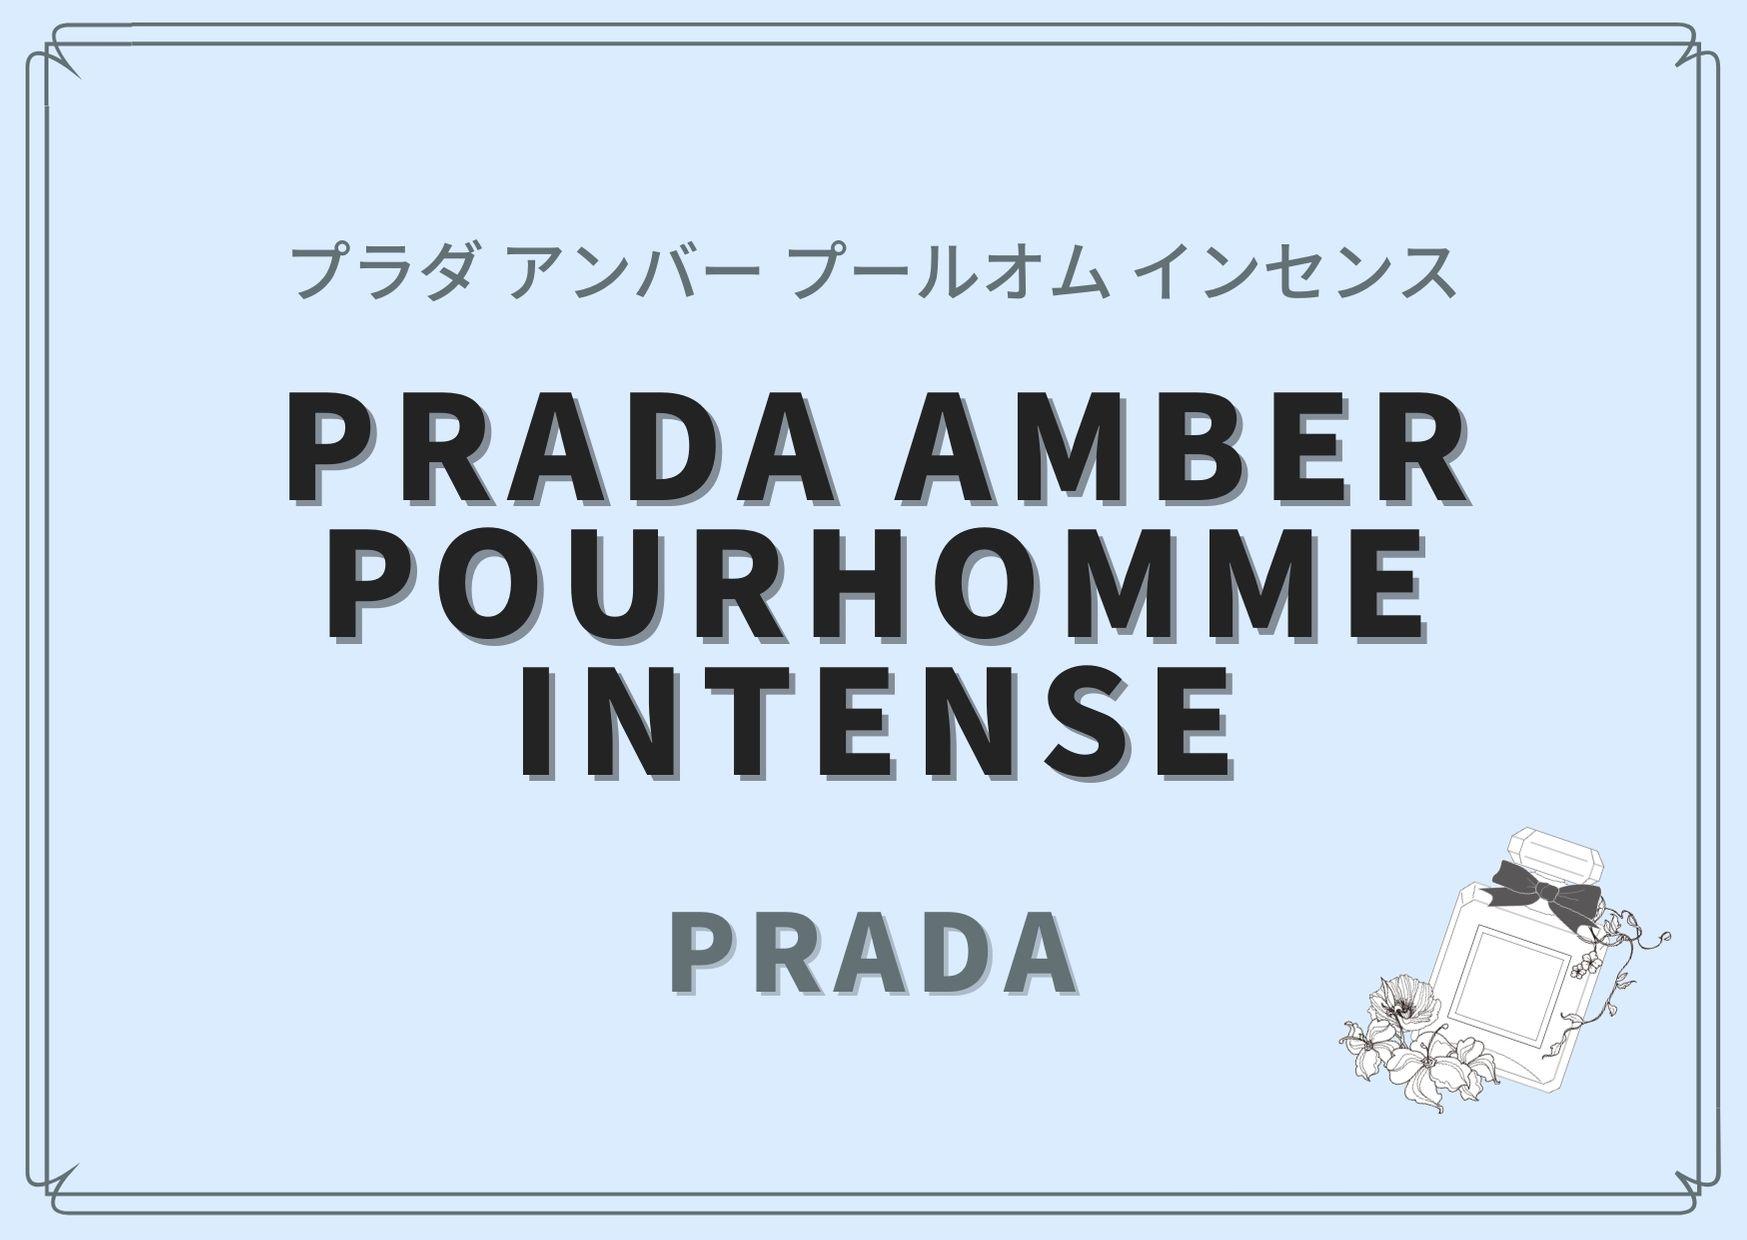 PRADA AMBER POURHOMME INTENSE(プラダ アンバー プールオム インセンス)/PRADA(プラダ)